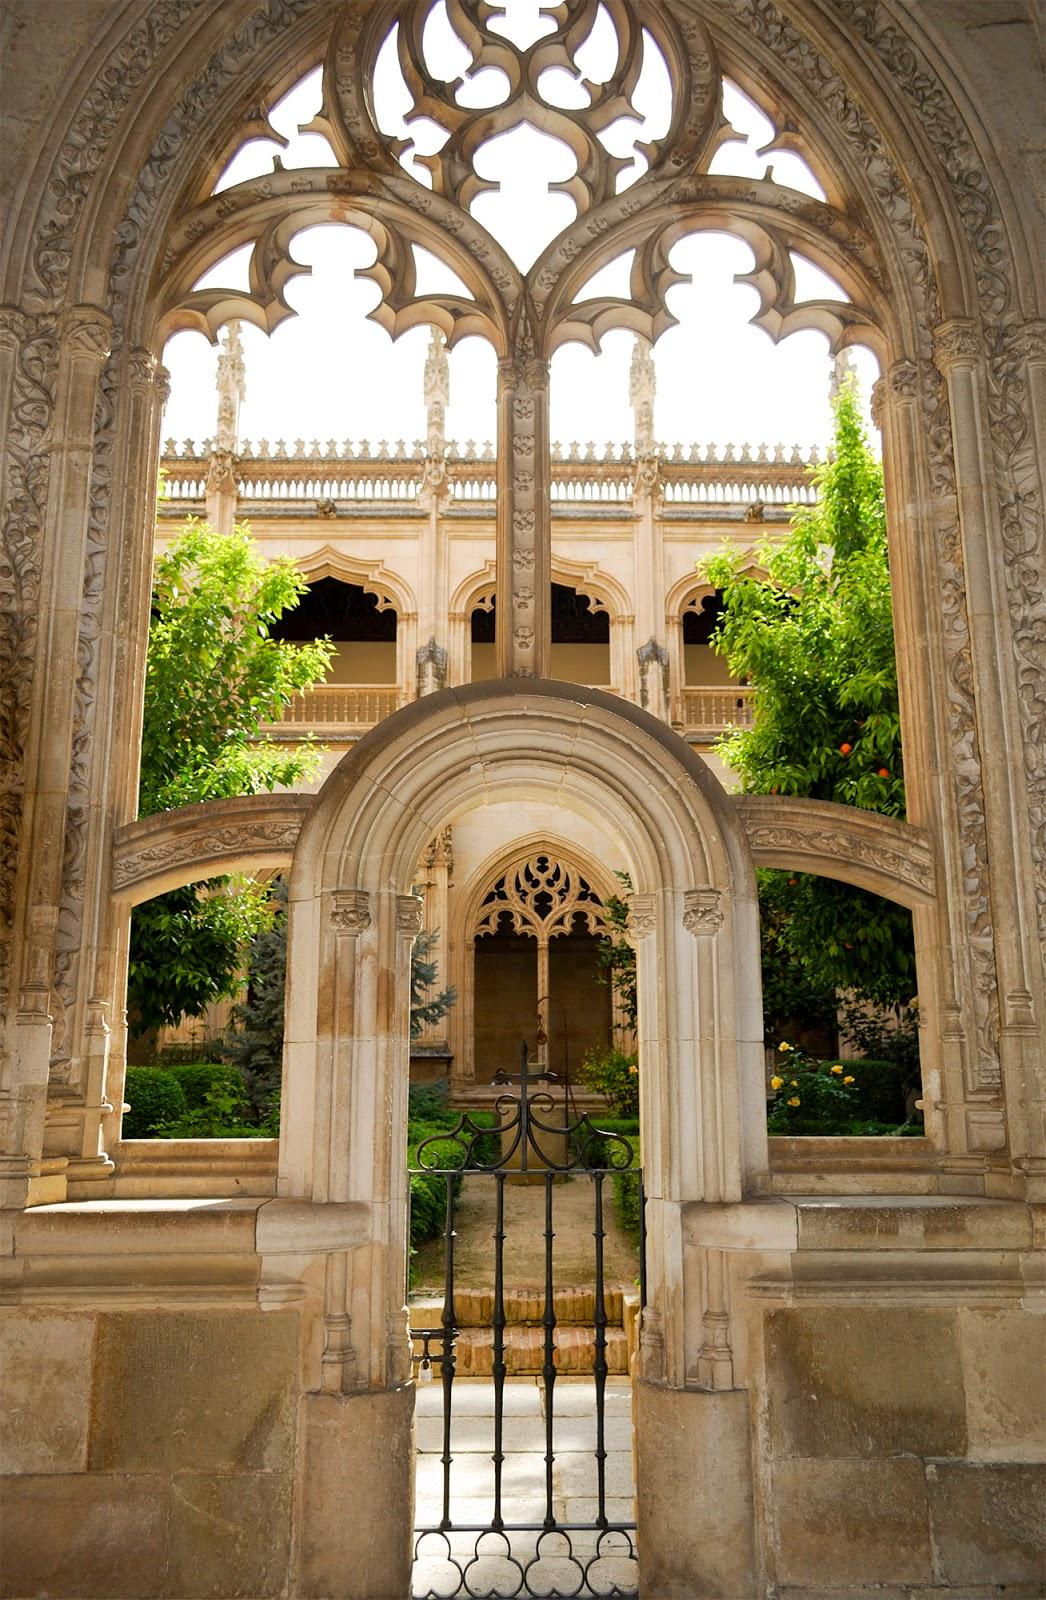 monastery cloister san juan reyes toledo spain landmark history travel guide tourism day trip itinerary